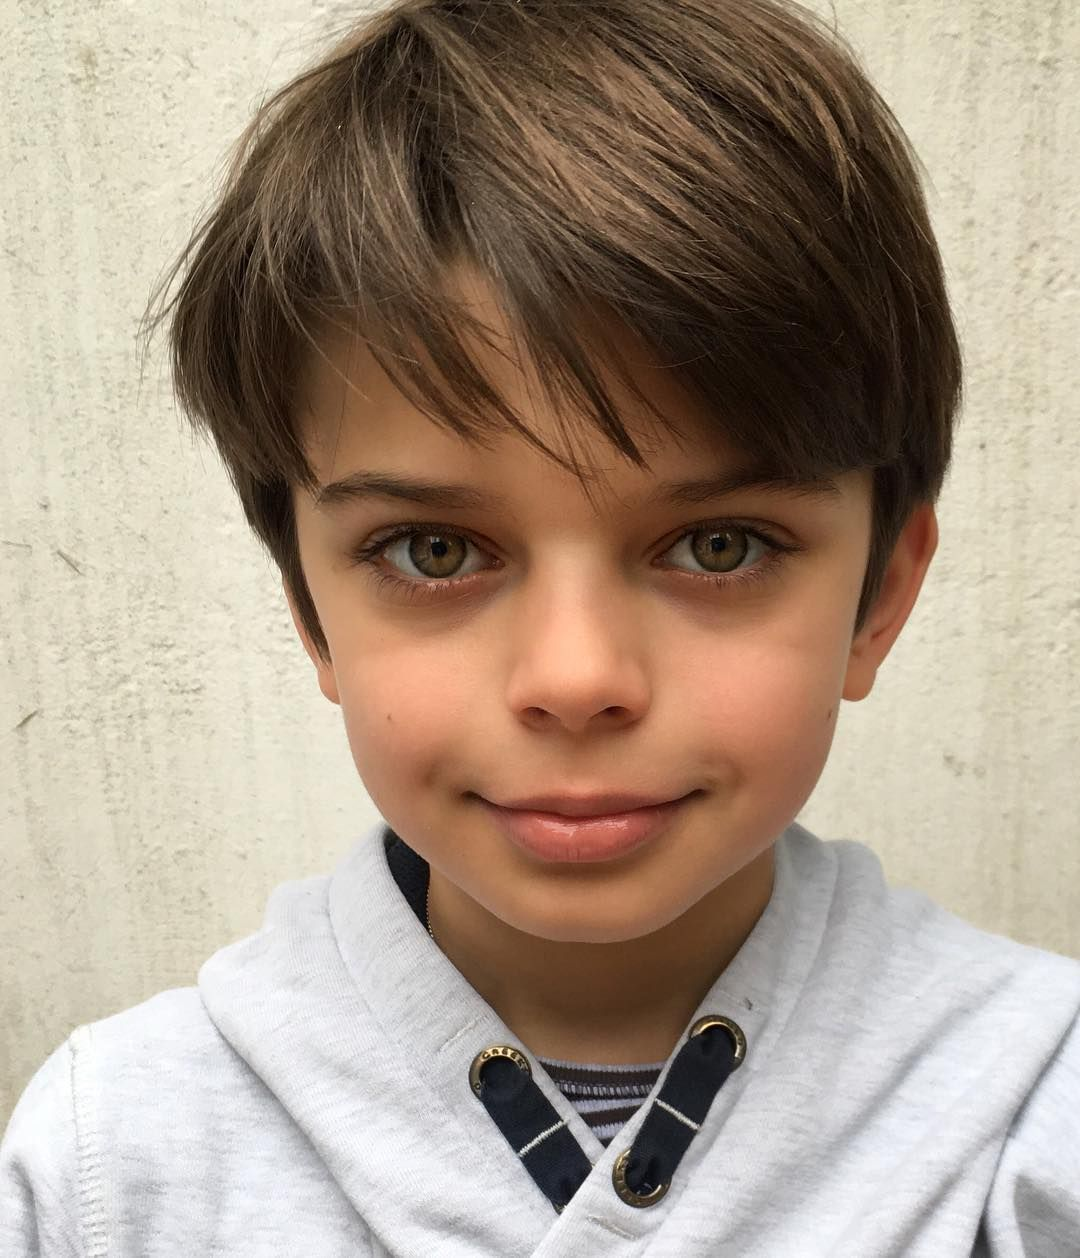 Jules Manchez On Instagram Just Me Julesmanchez Littlemodel Greeneyes Sweat Boy Modelboy Pho Boy Haircuts Long Little Boy Haircuts Young Cute Boys